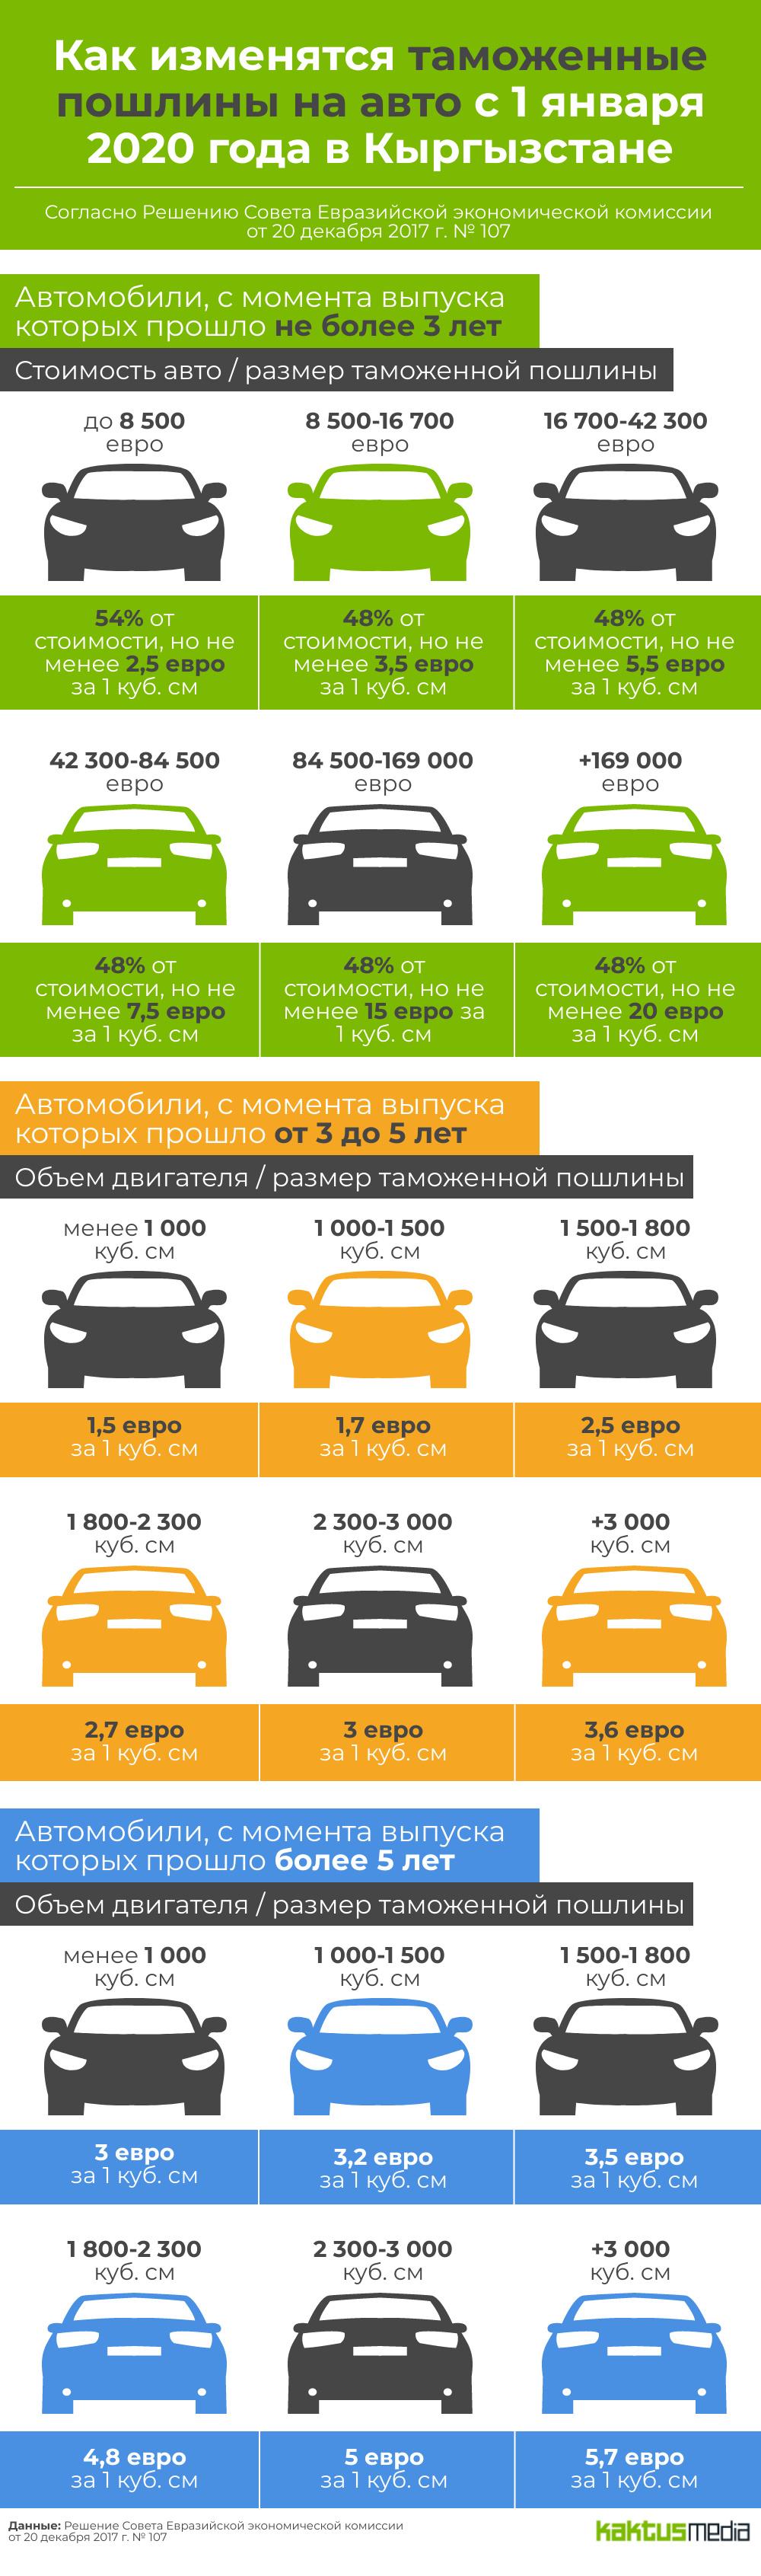 Какова таможенная пошлина на автомобили